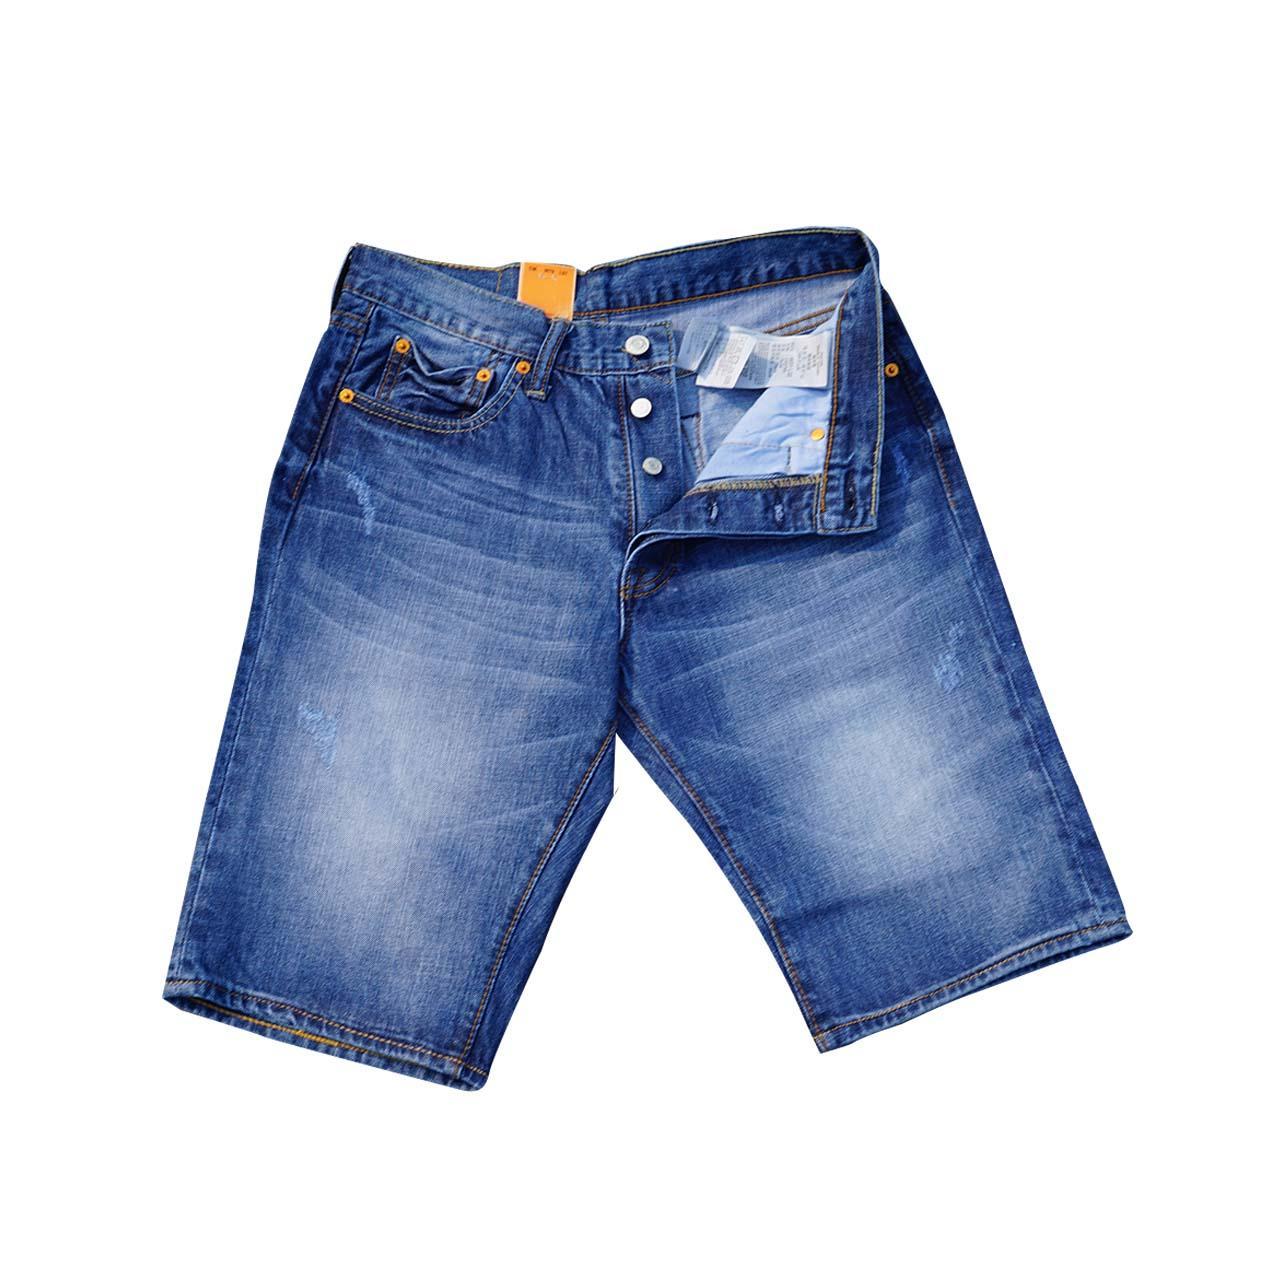 Kelebihan Levis 501 Graphic Tee Core Indigo Original Fit Jeans Rocky Road 00501 2563 Size 38 Celana Import Pendek Ab